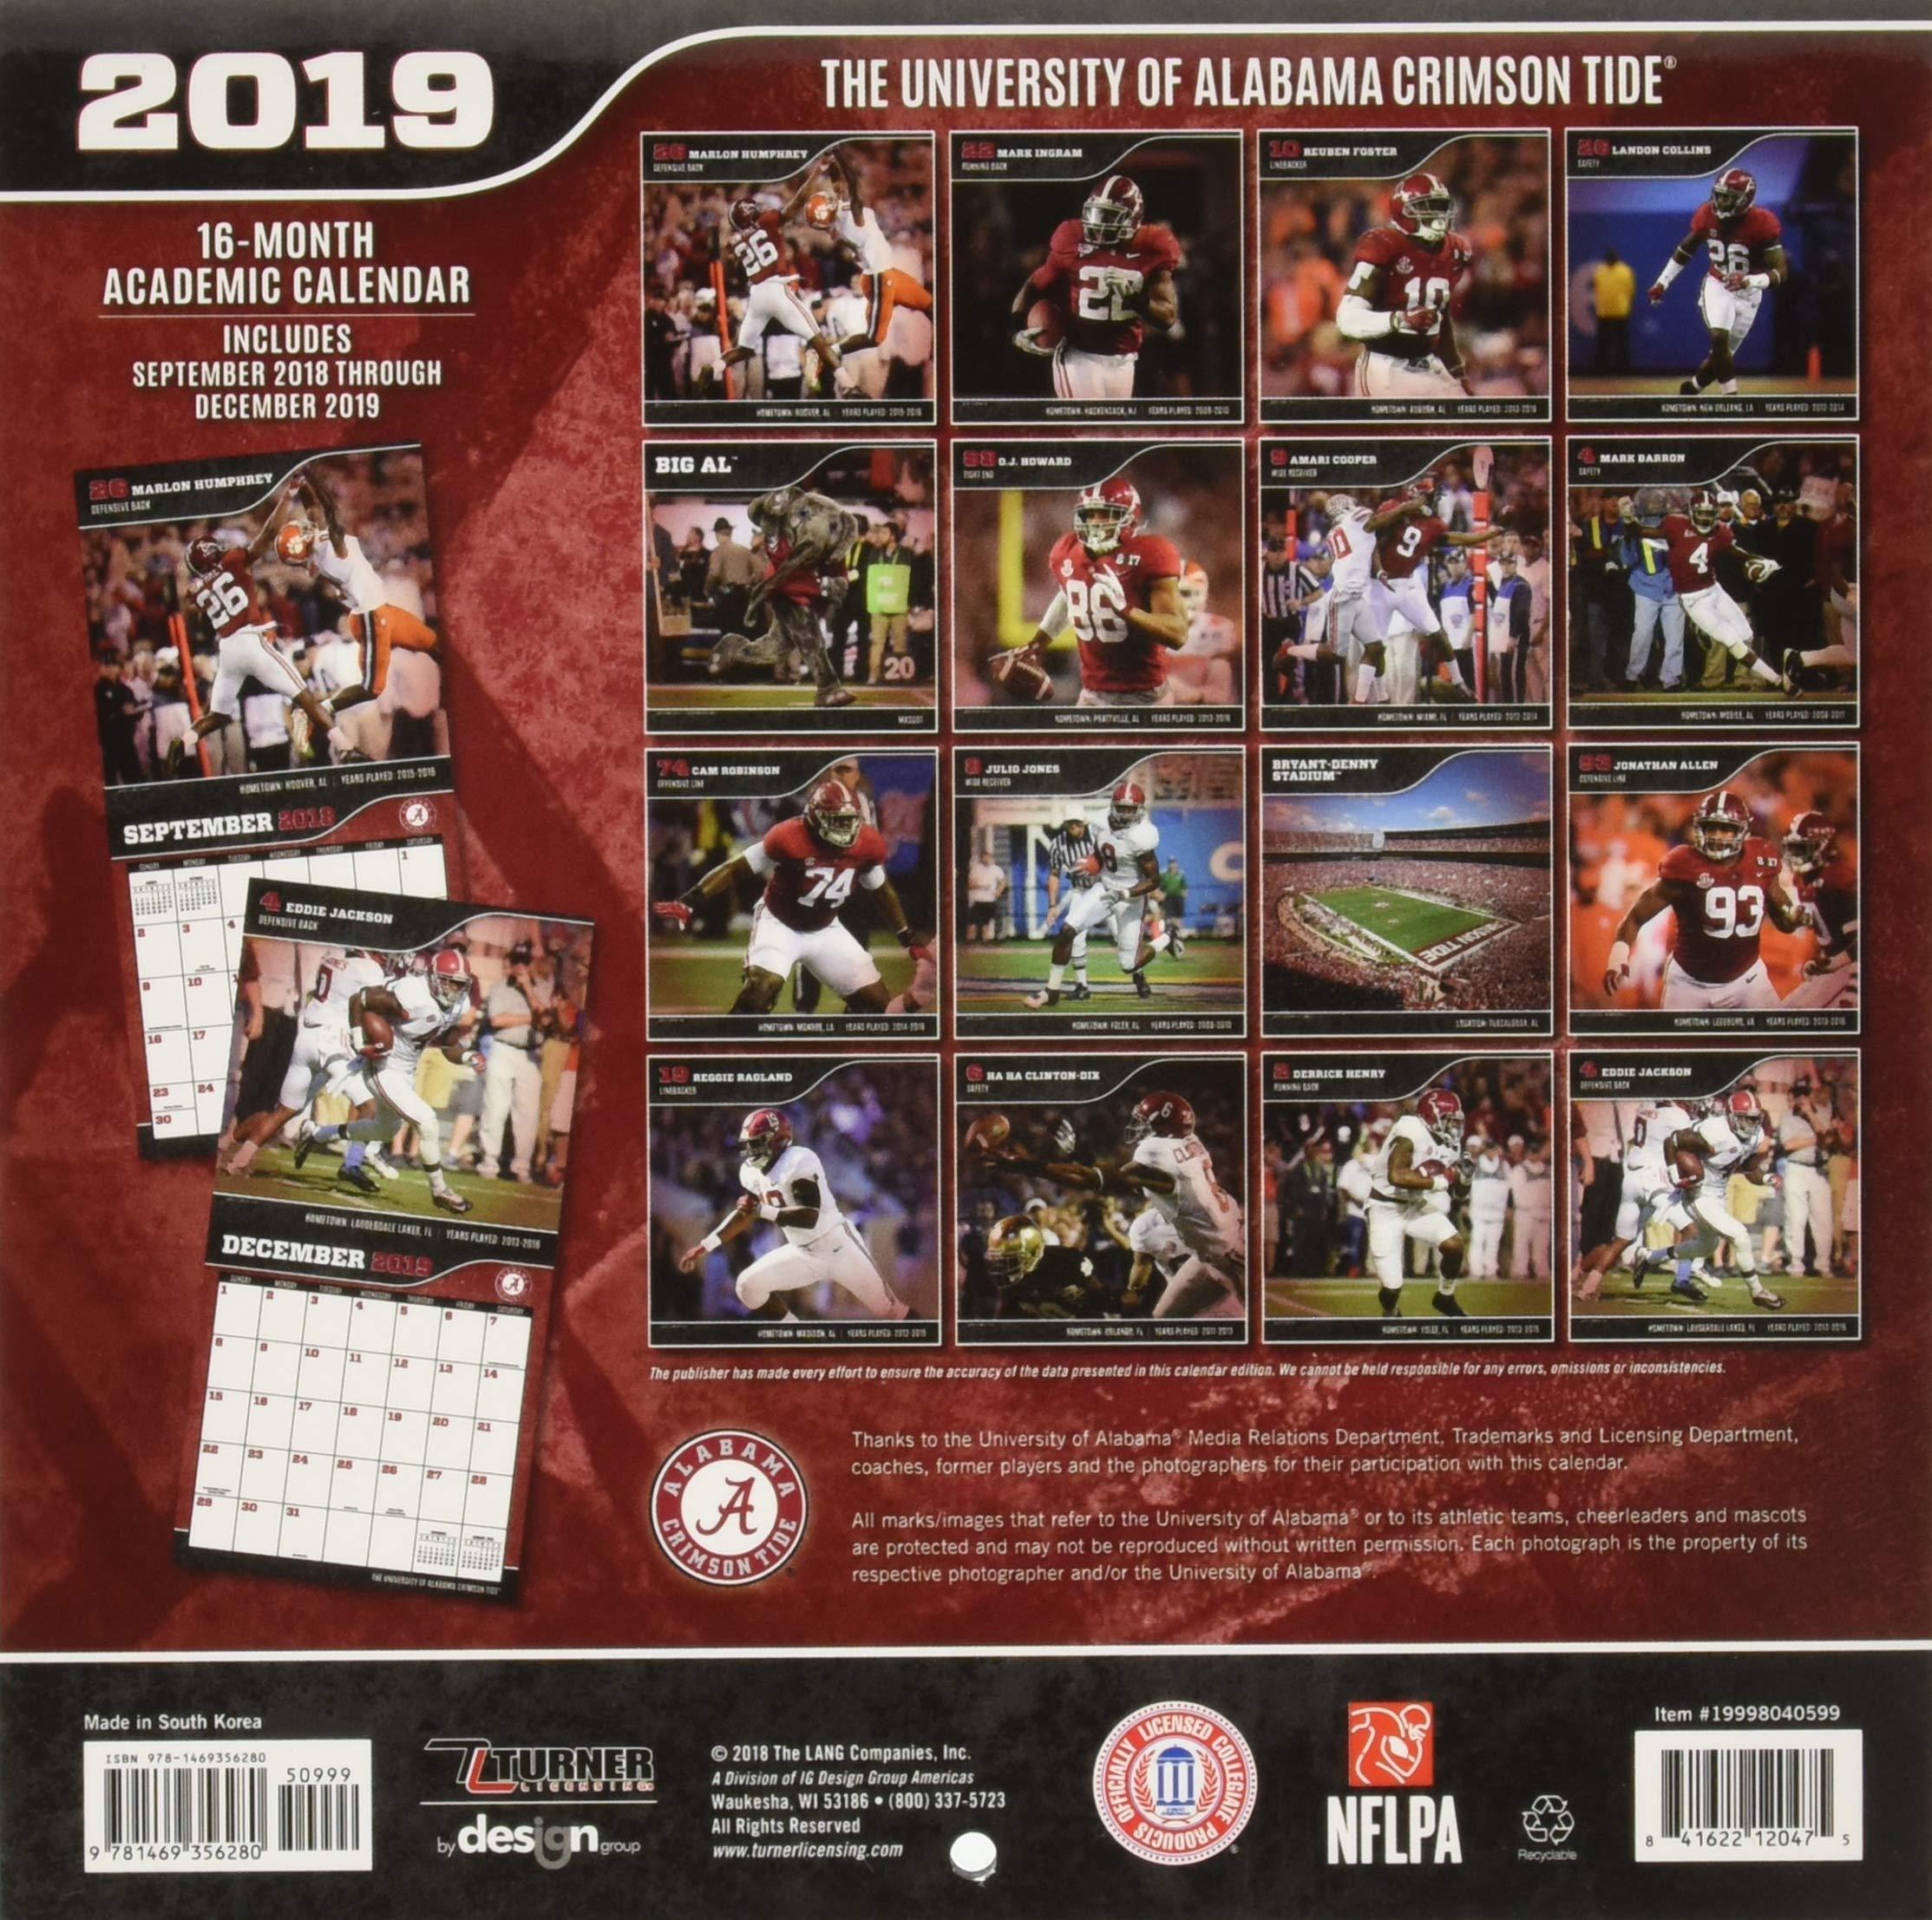 University Of Alabama Academic Calendar.The University Of Alabama Crimson Tide 2019 Calendar Inc Lang